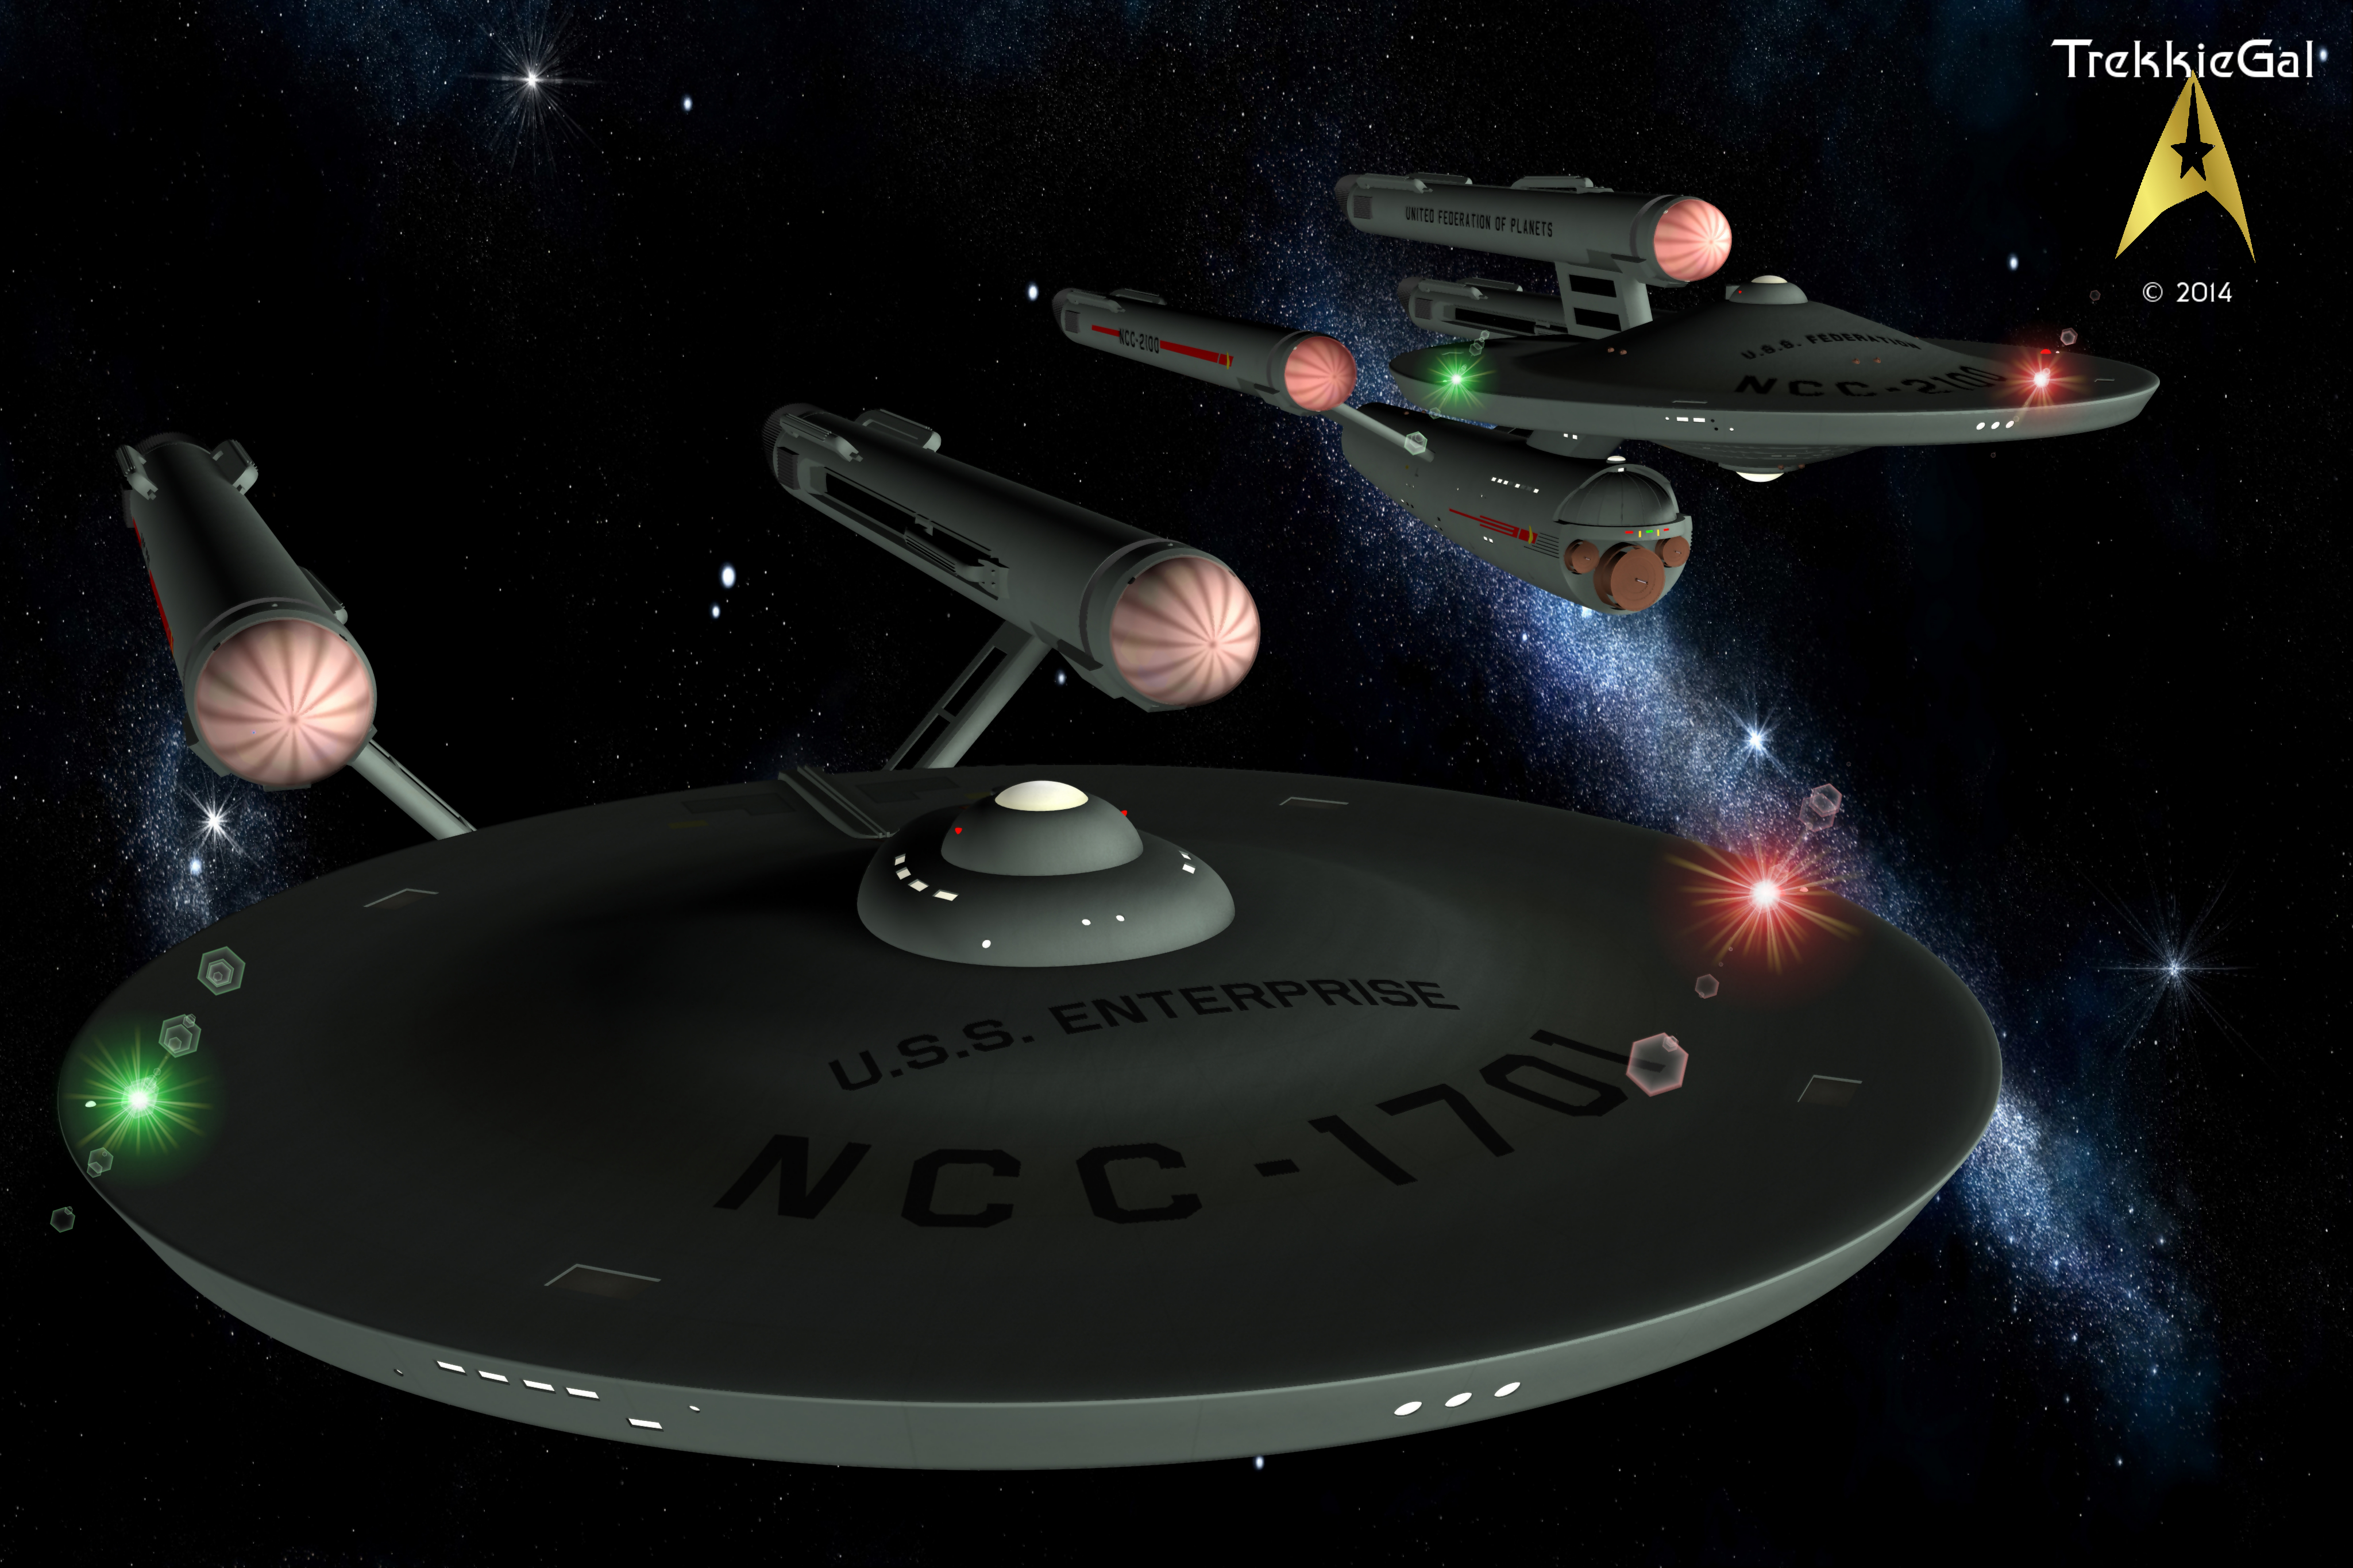 Flagships-005 by TrekkieGal